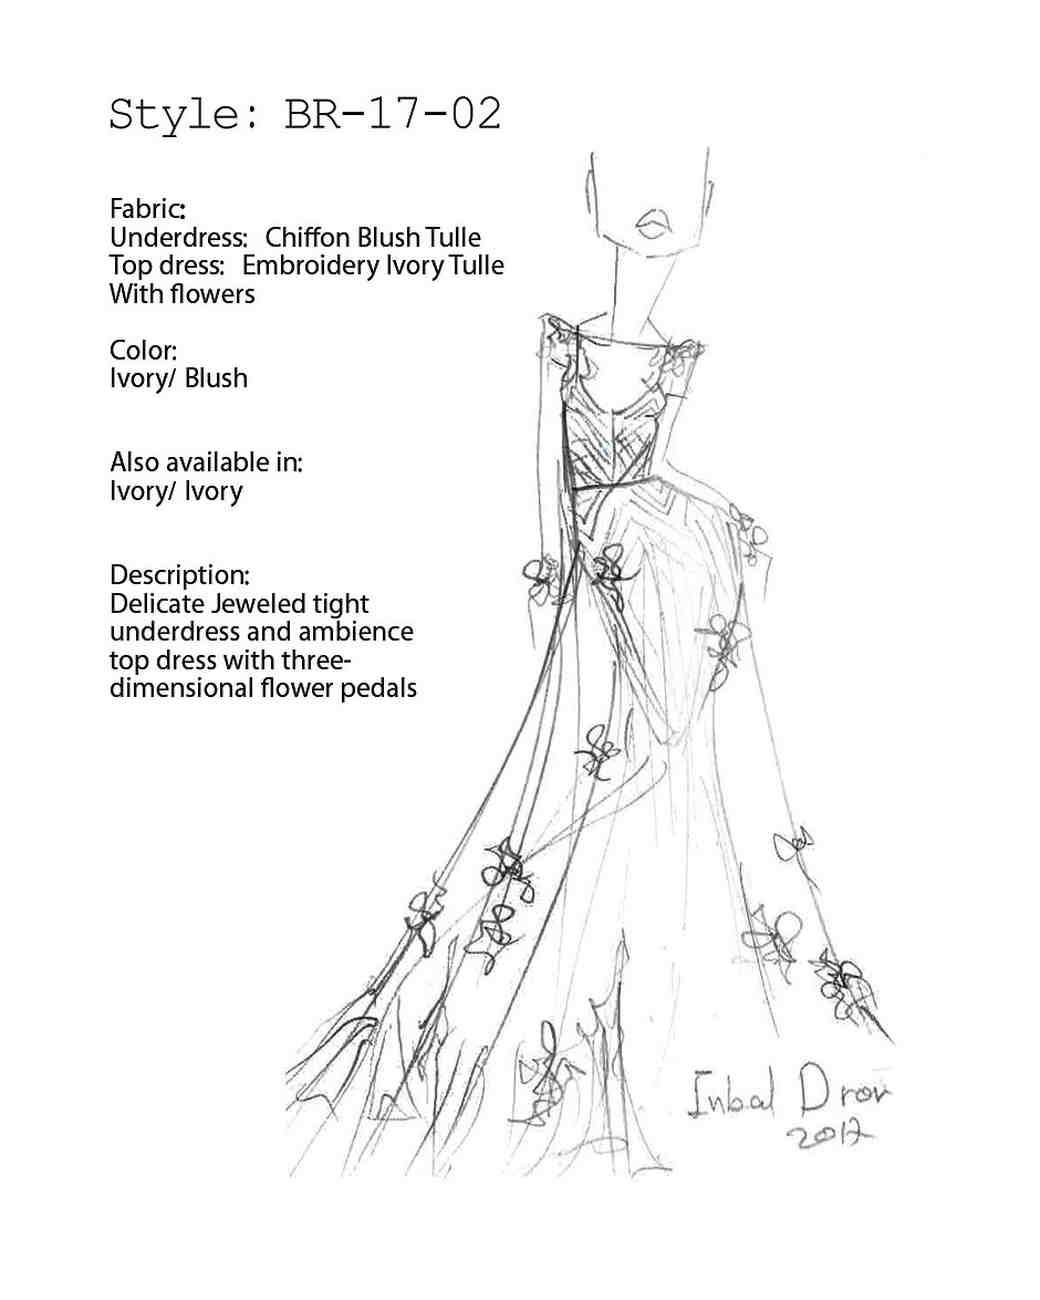 inbal dror fall 2017 exclusive wedding dress sketch